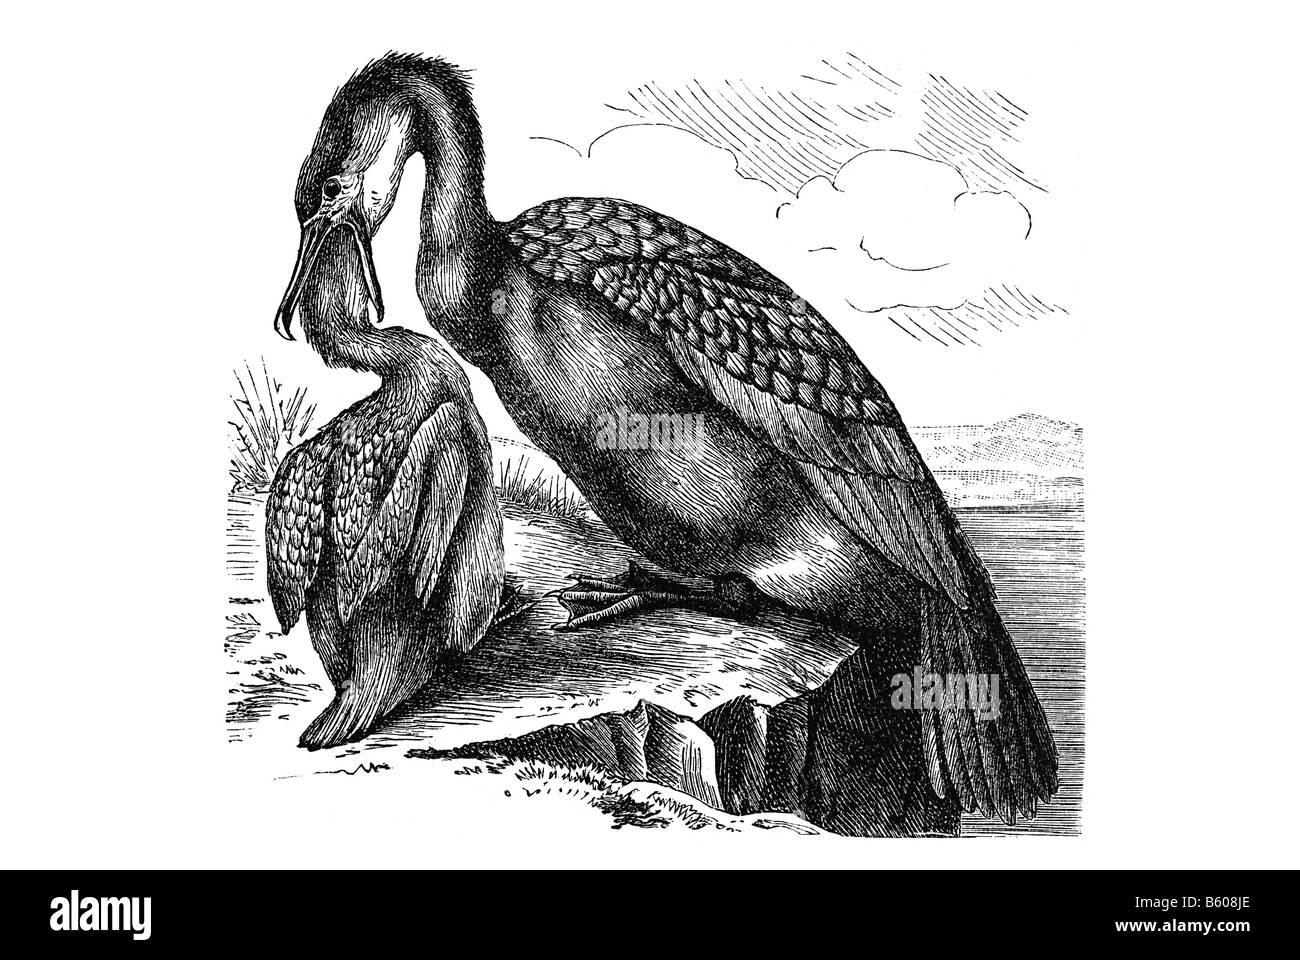 Great Cormorant (Phalacrocorax carbo) - Stock Image